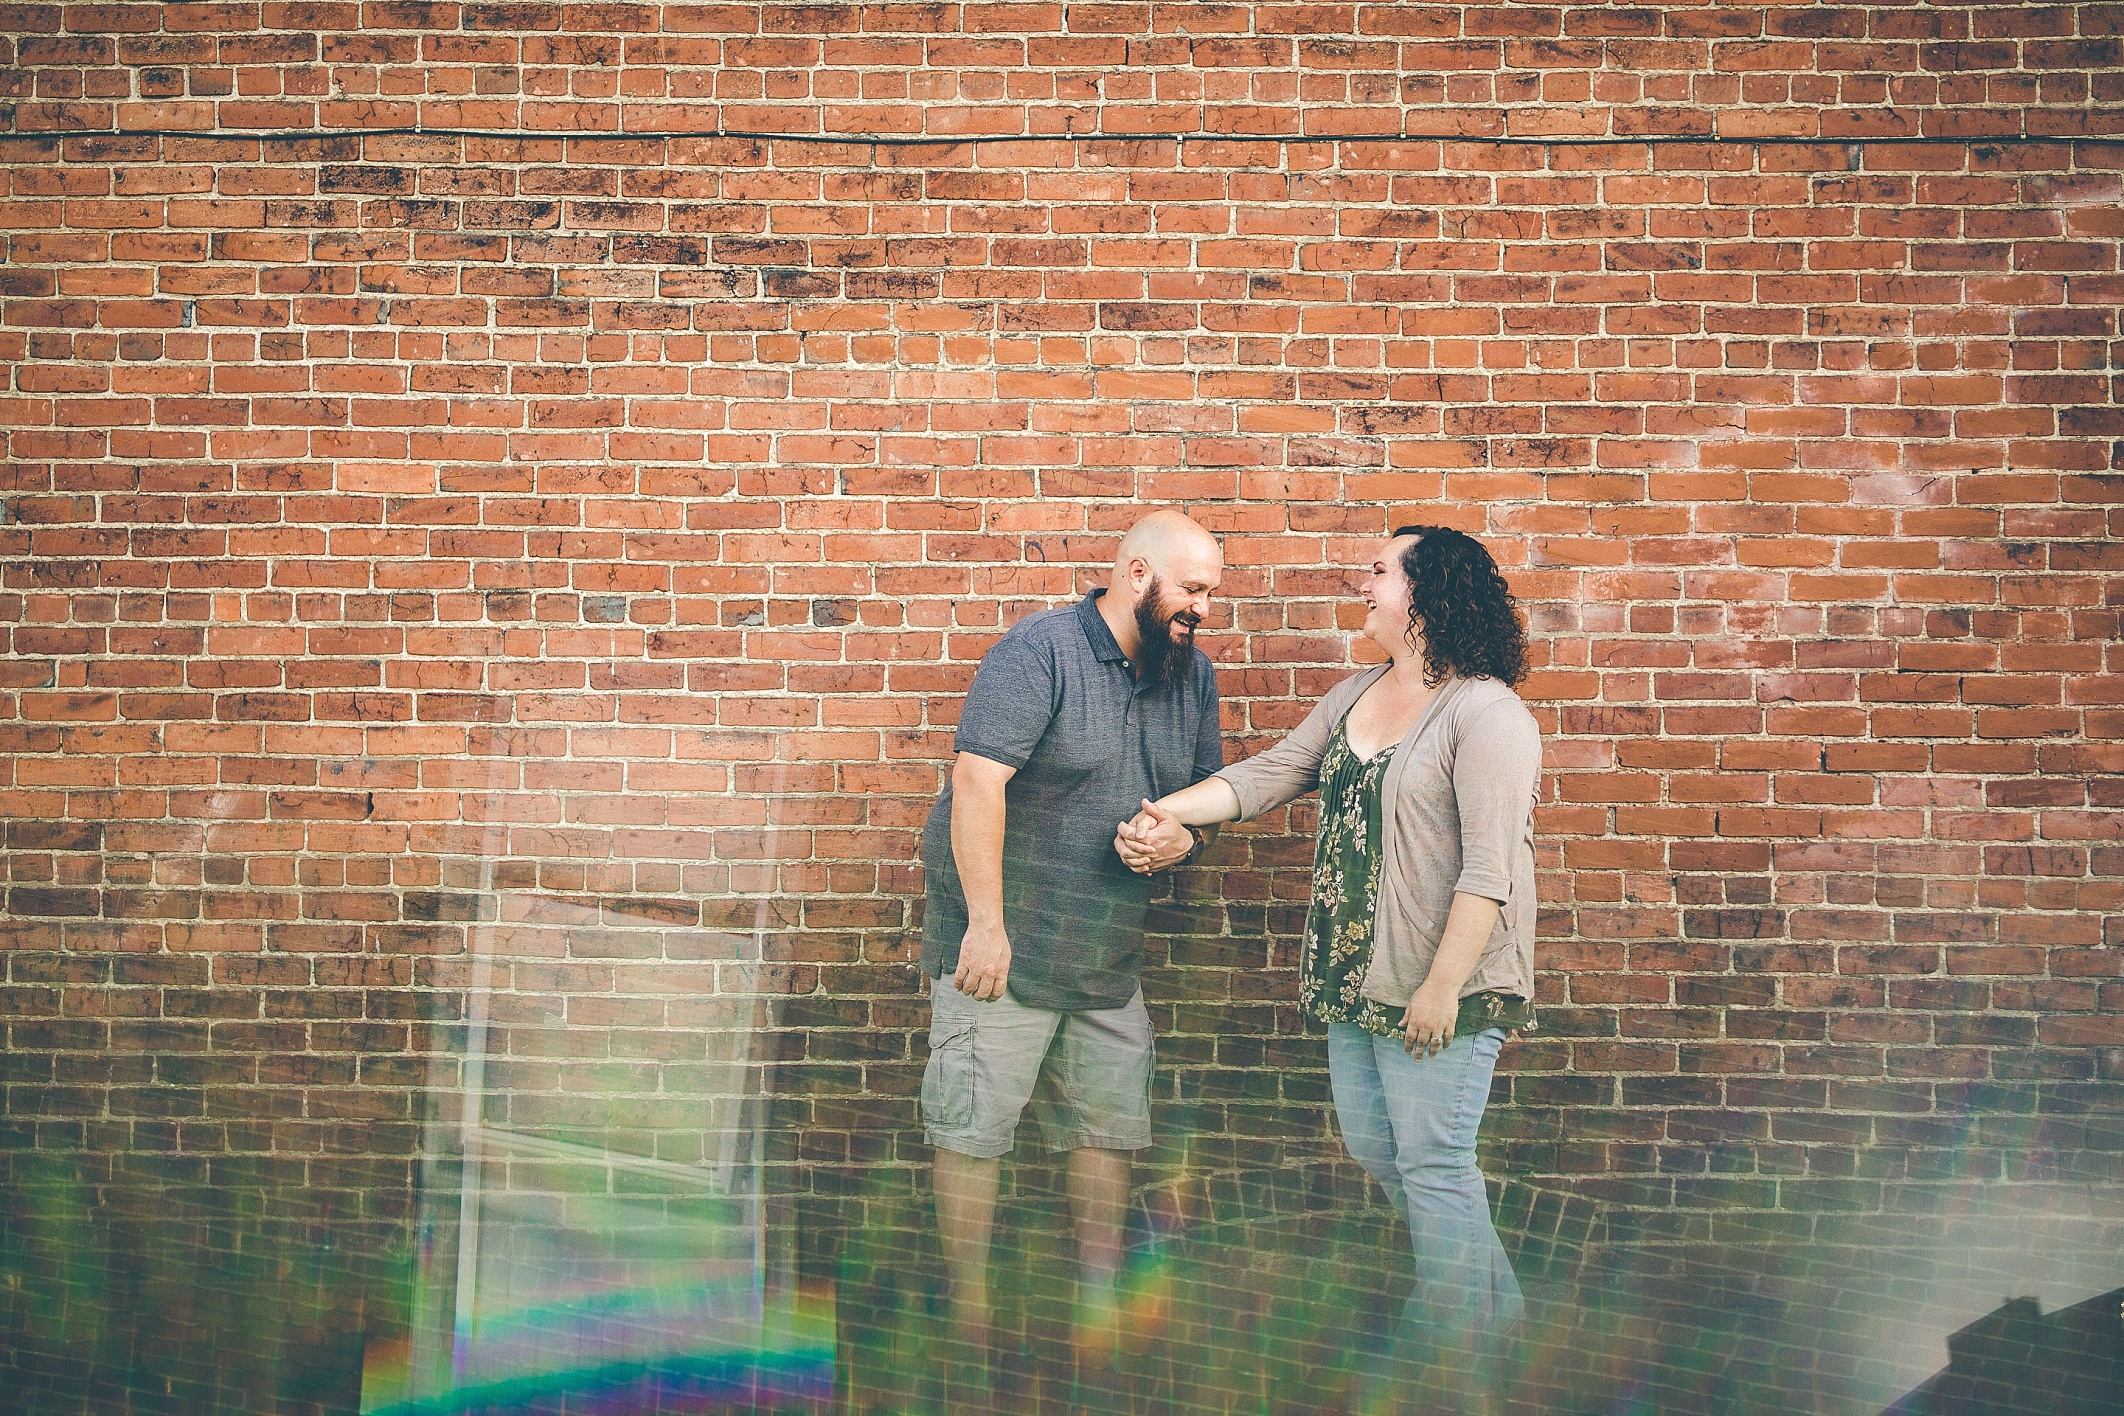 engagement-photographer--miamisburg-germantown-ohio-oregon_0062.jpg